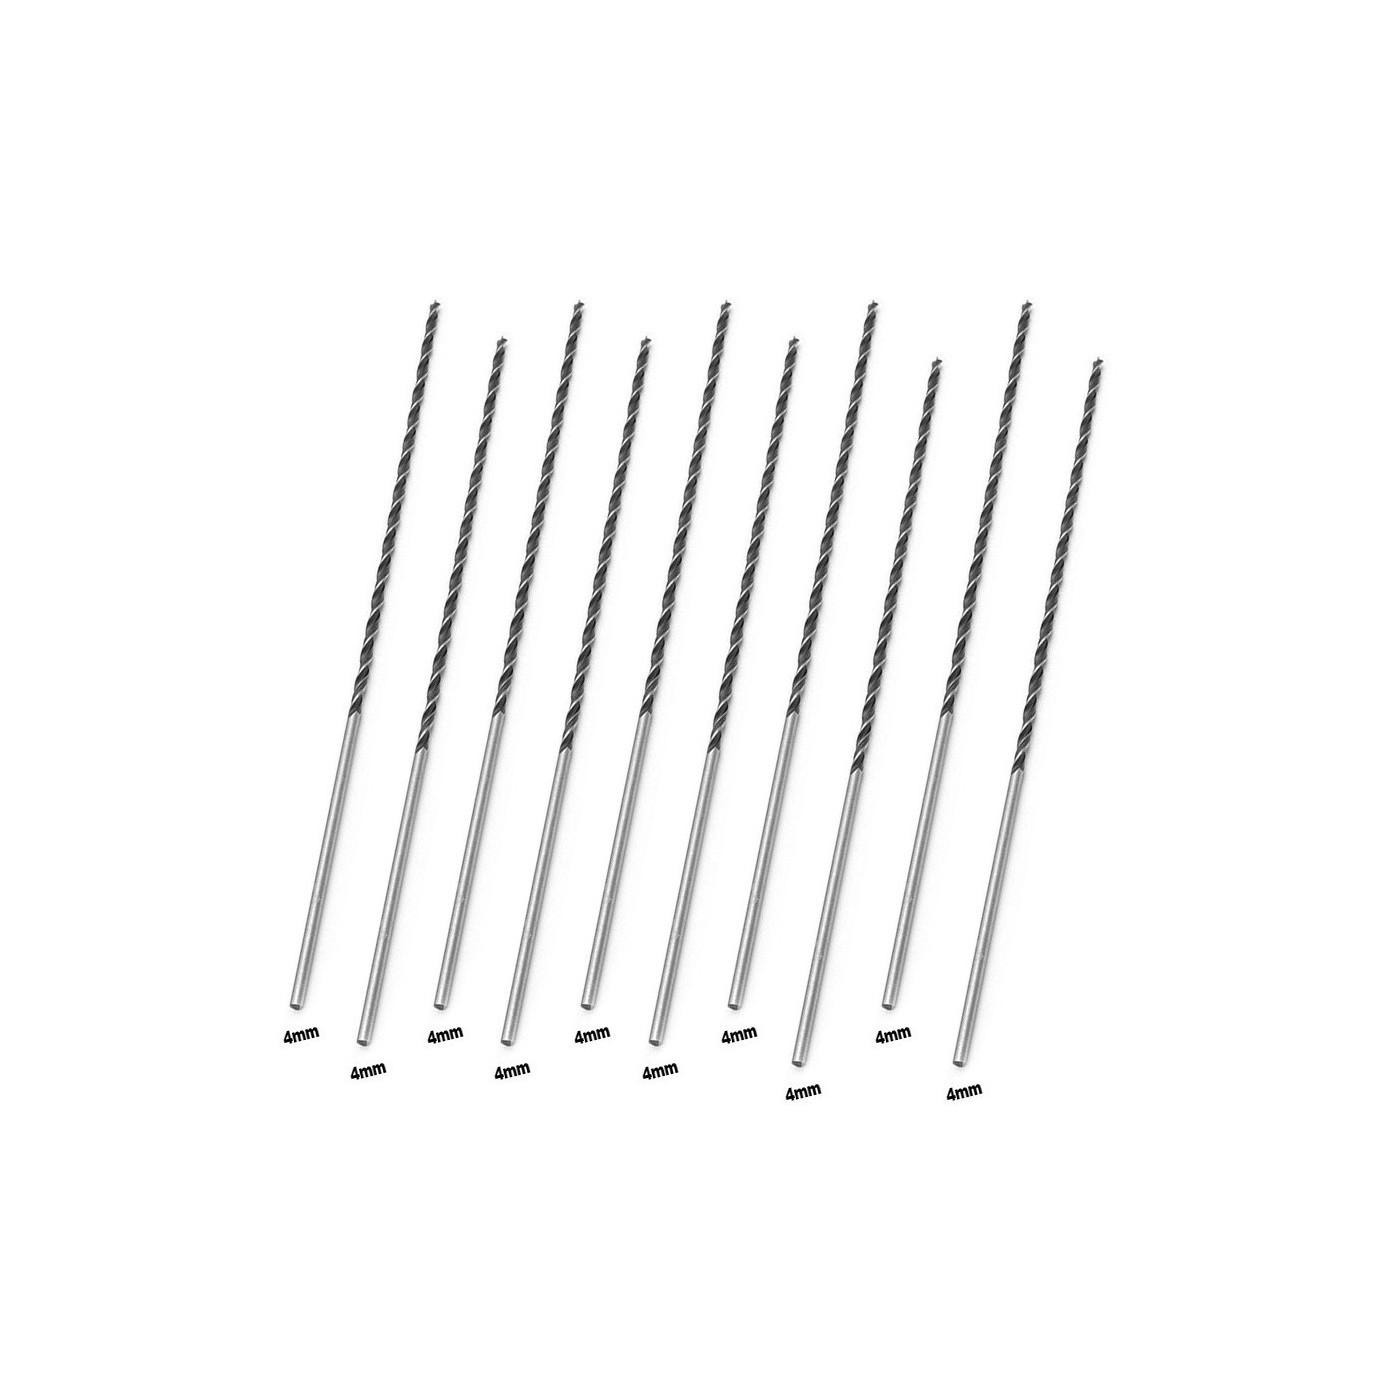 Juego de 10 brocas de madera extra largas (4x300 mm)  - 1